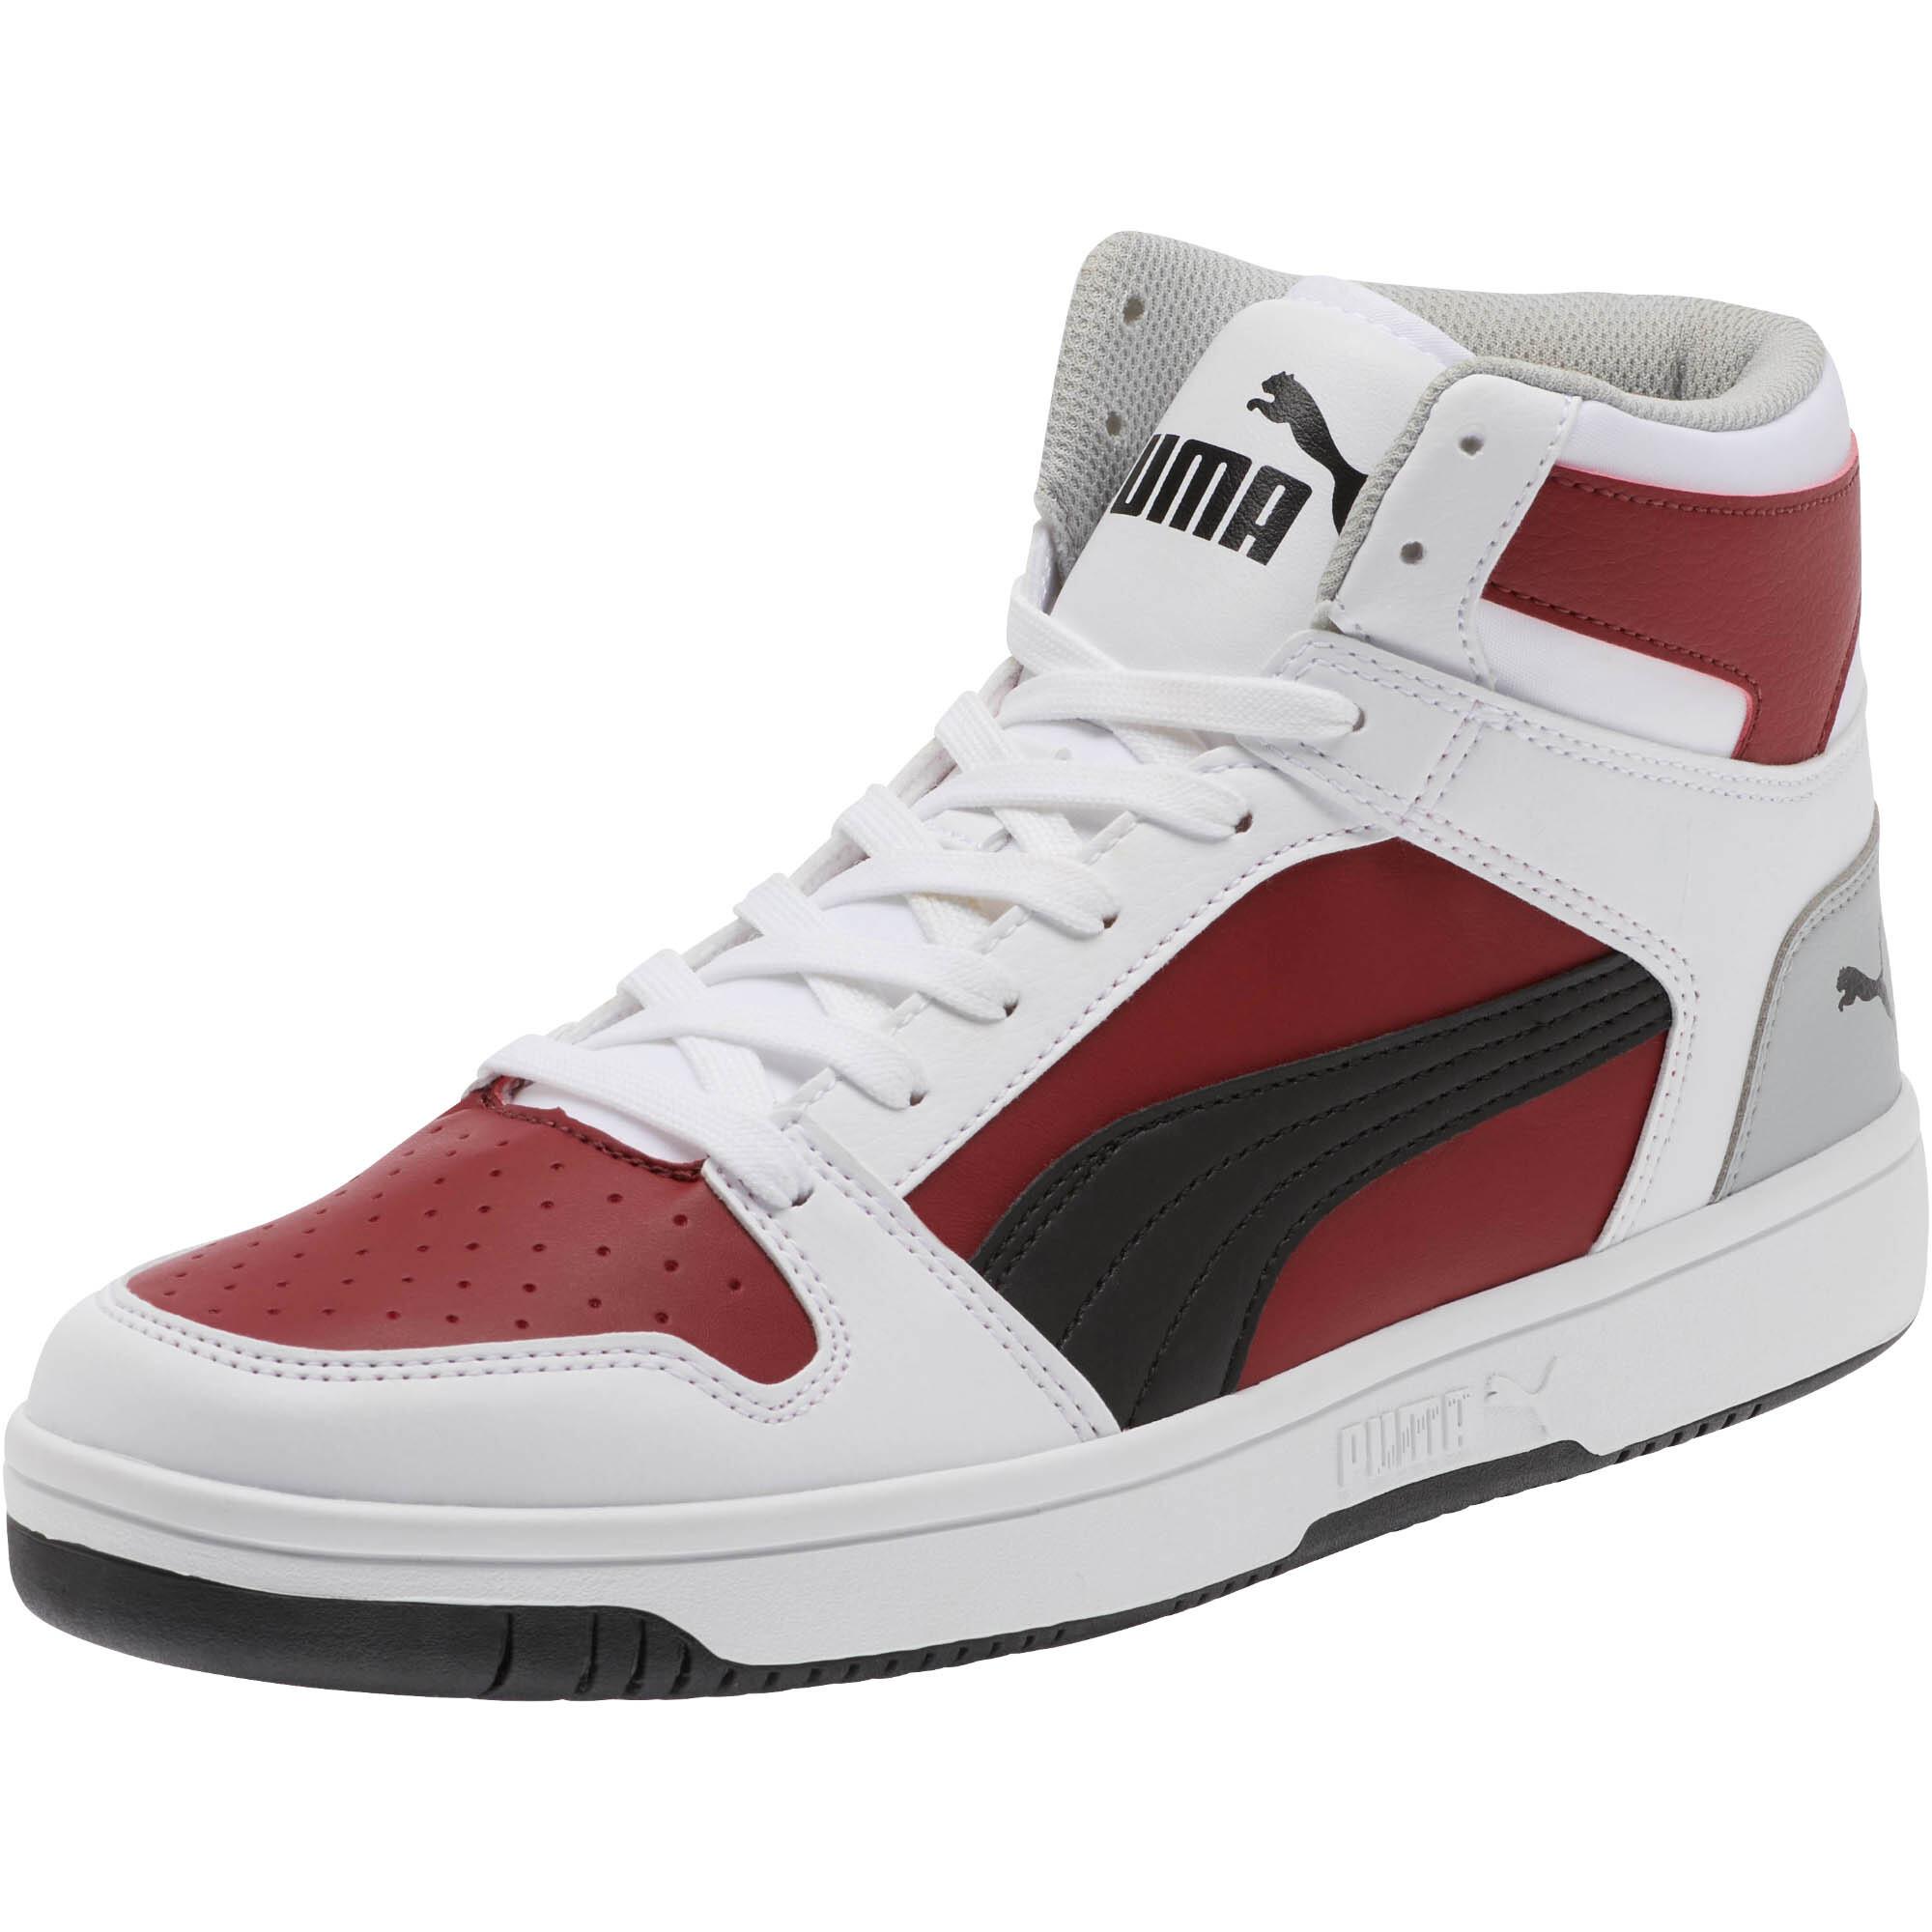 PUMA-PUMA-Rebound-LayUp-Men-039-s-Sneakers-Men-Mid-Boot-Basics thumbnail 7